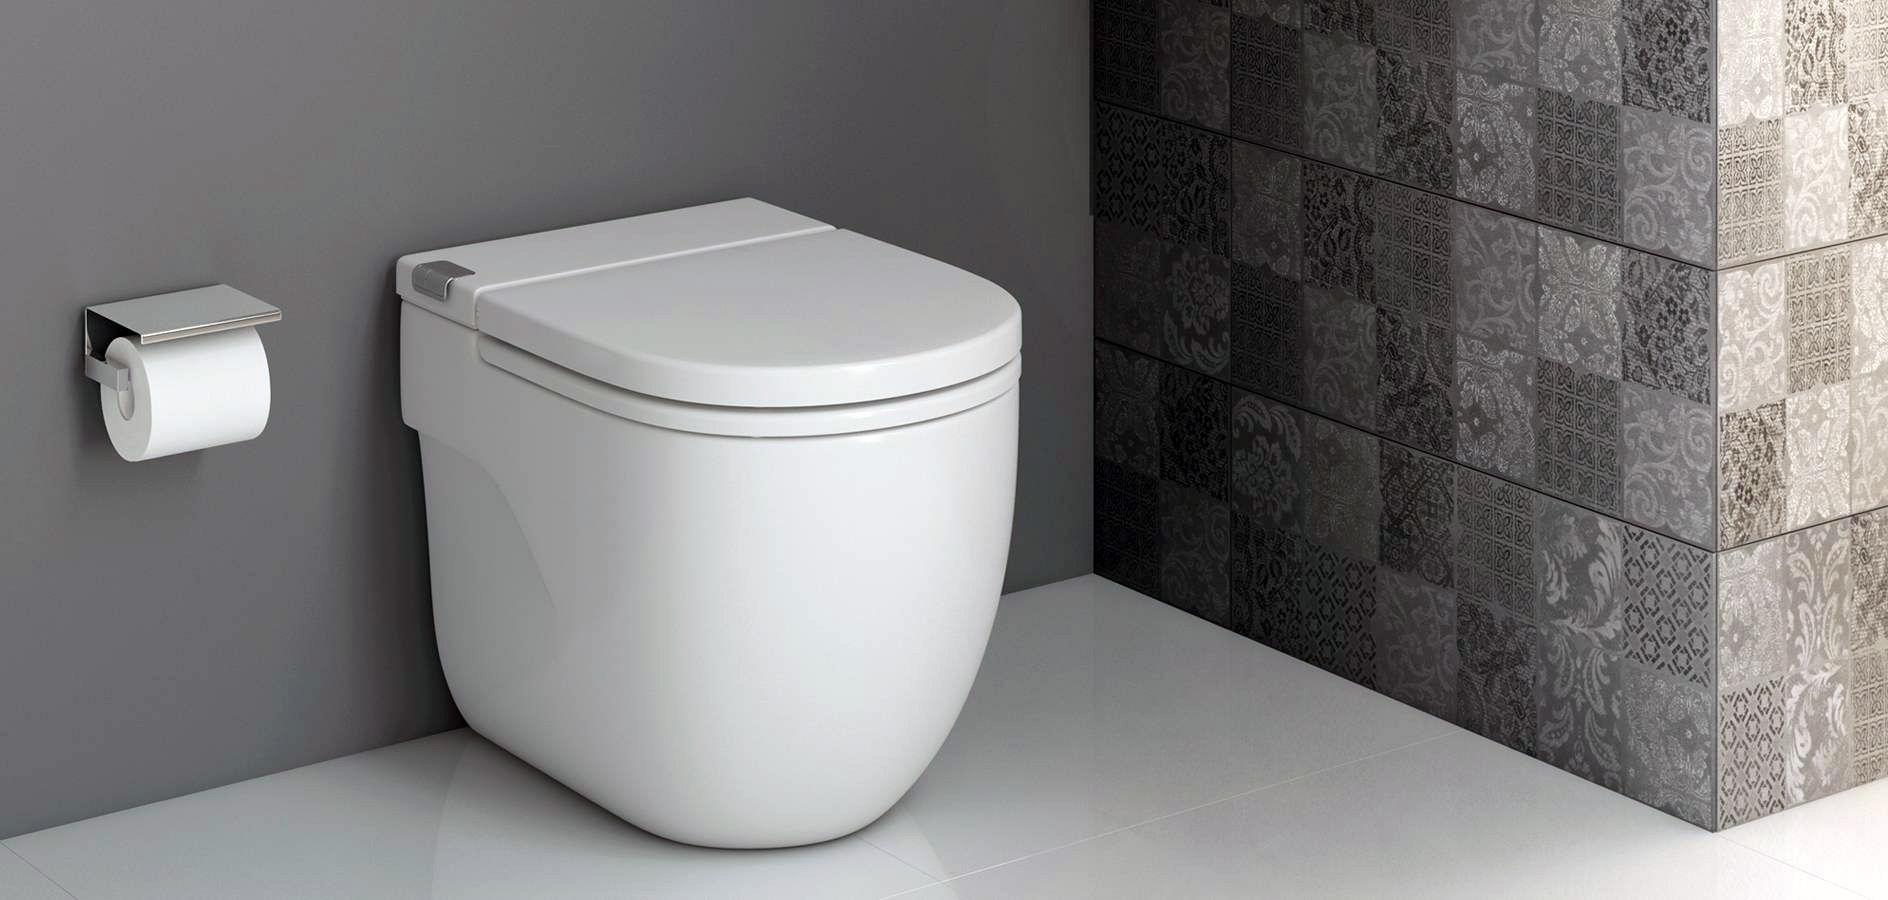 Sleek Toilet Design